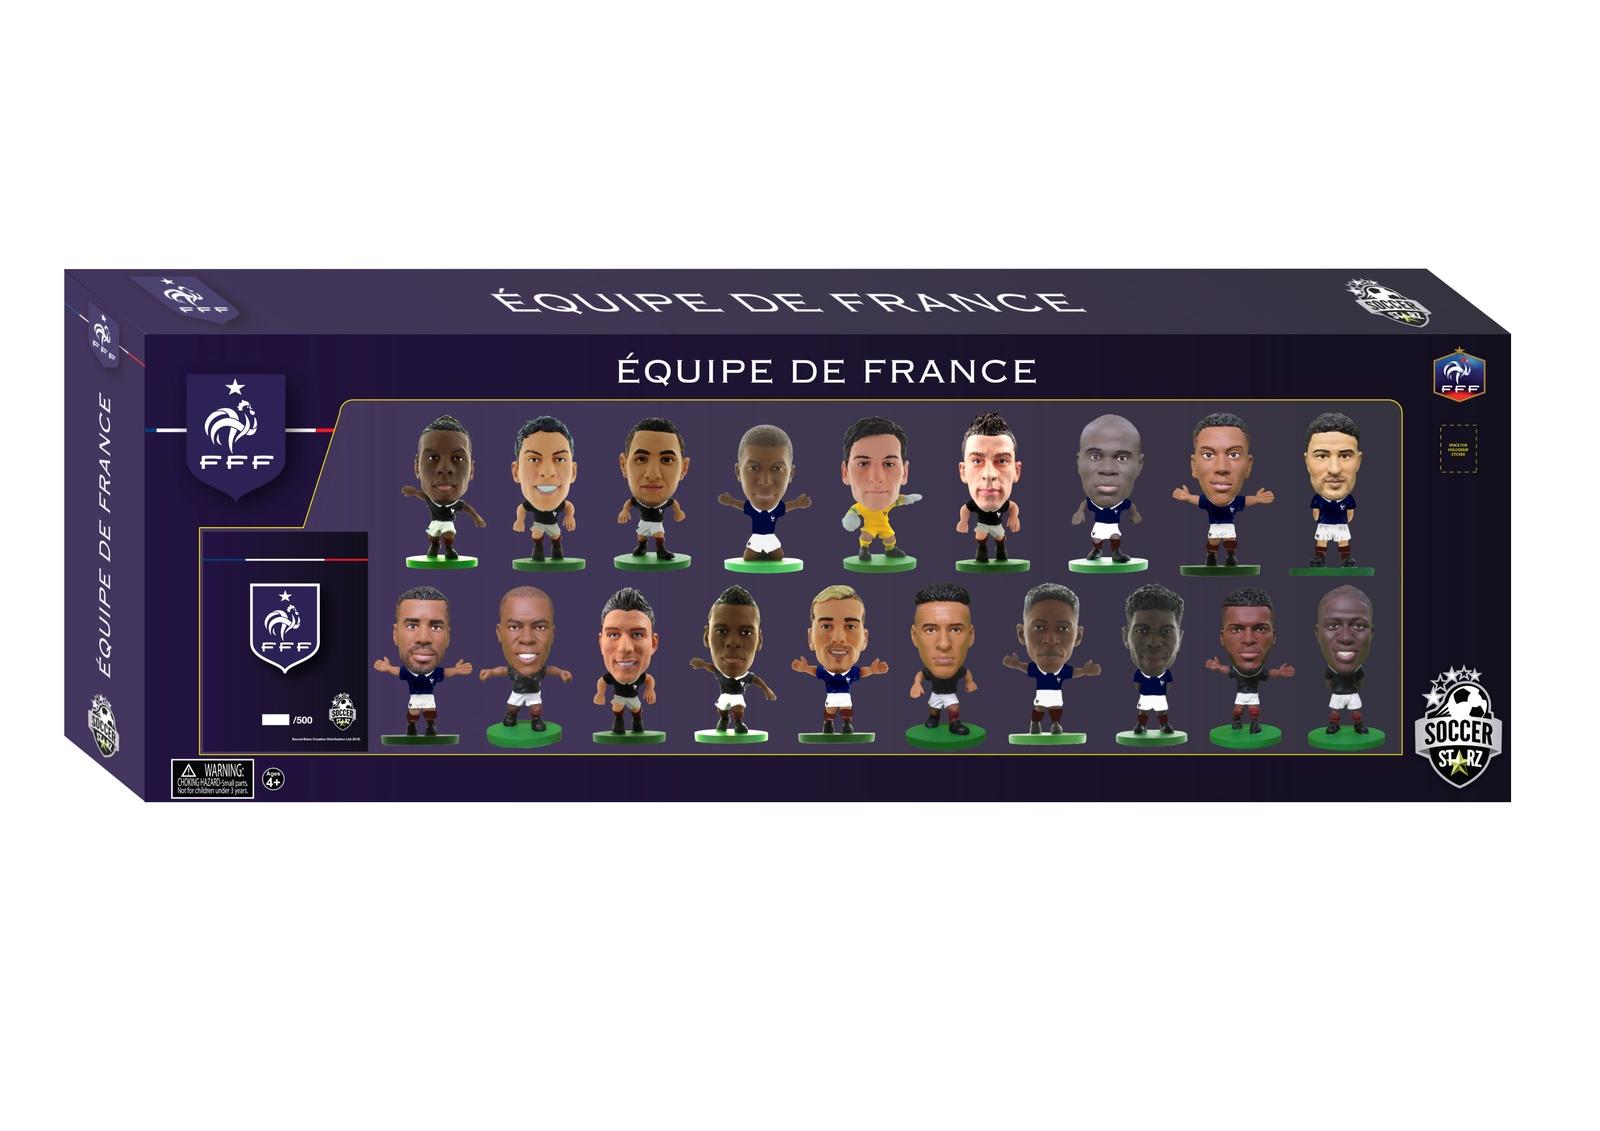 Фигурка Soccerstarz Набор футболистов Сборная Франции France Team Pack 19 players 2018, 404465 цена в Москве и Питере